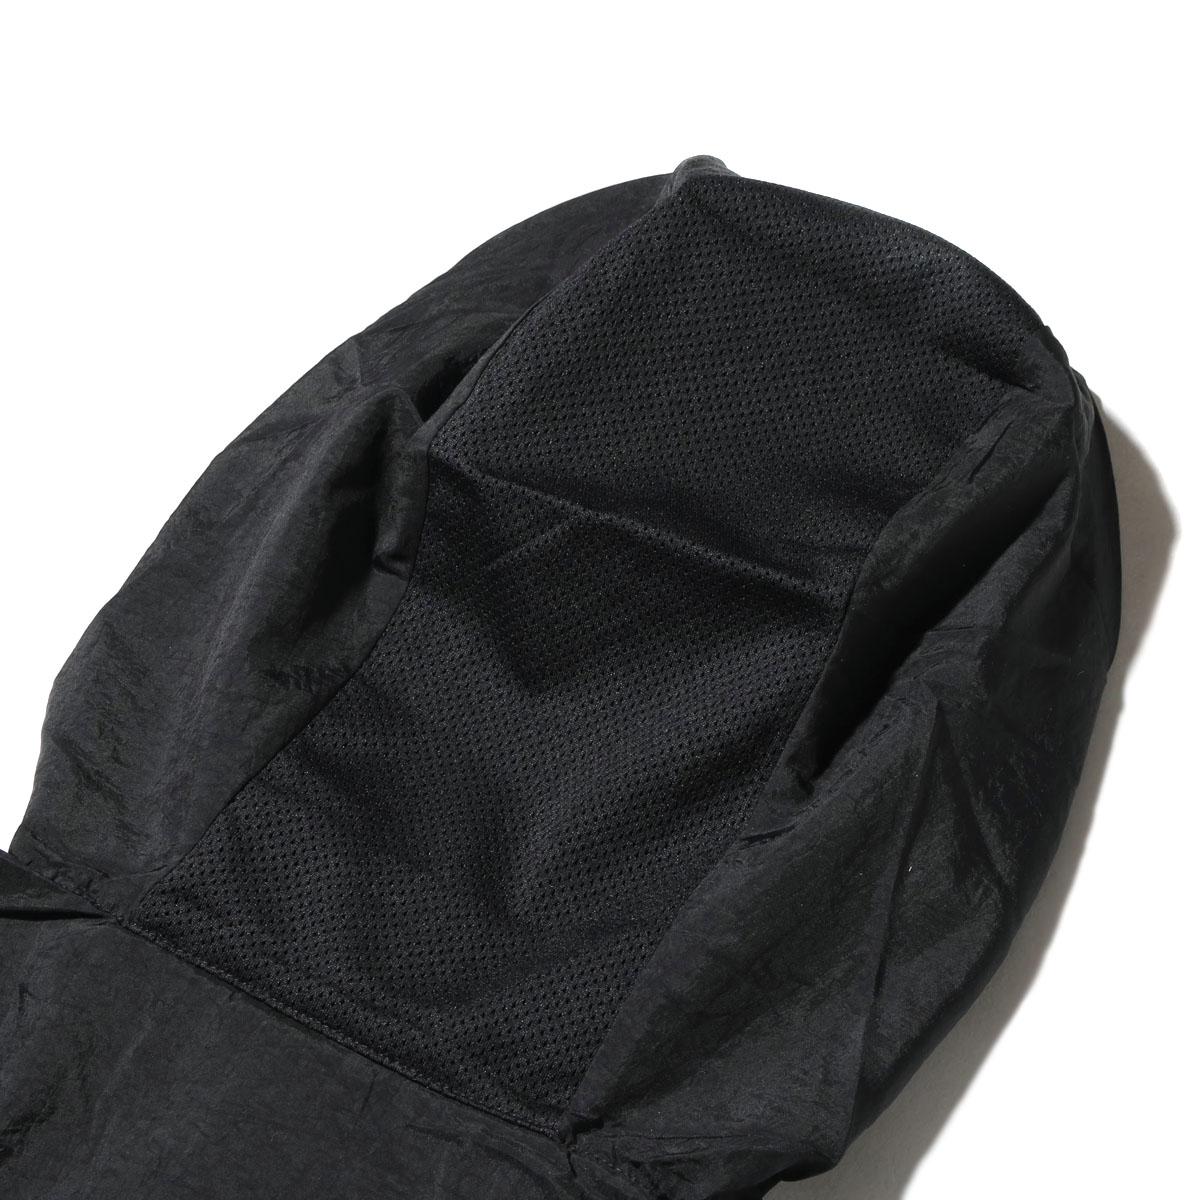 NIKE AS M NSW JKT HD WVN PKBL (ナイキウーブンパッカブルフーディジャケット) (BLACK/WHITE) 17SU-I